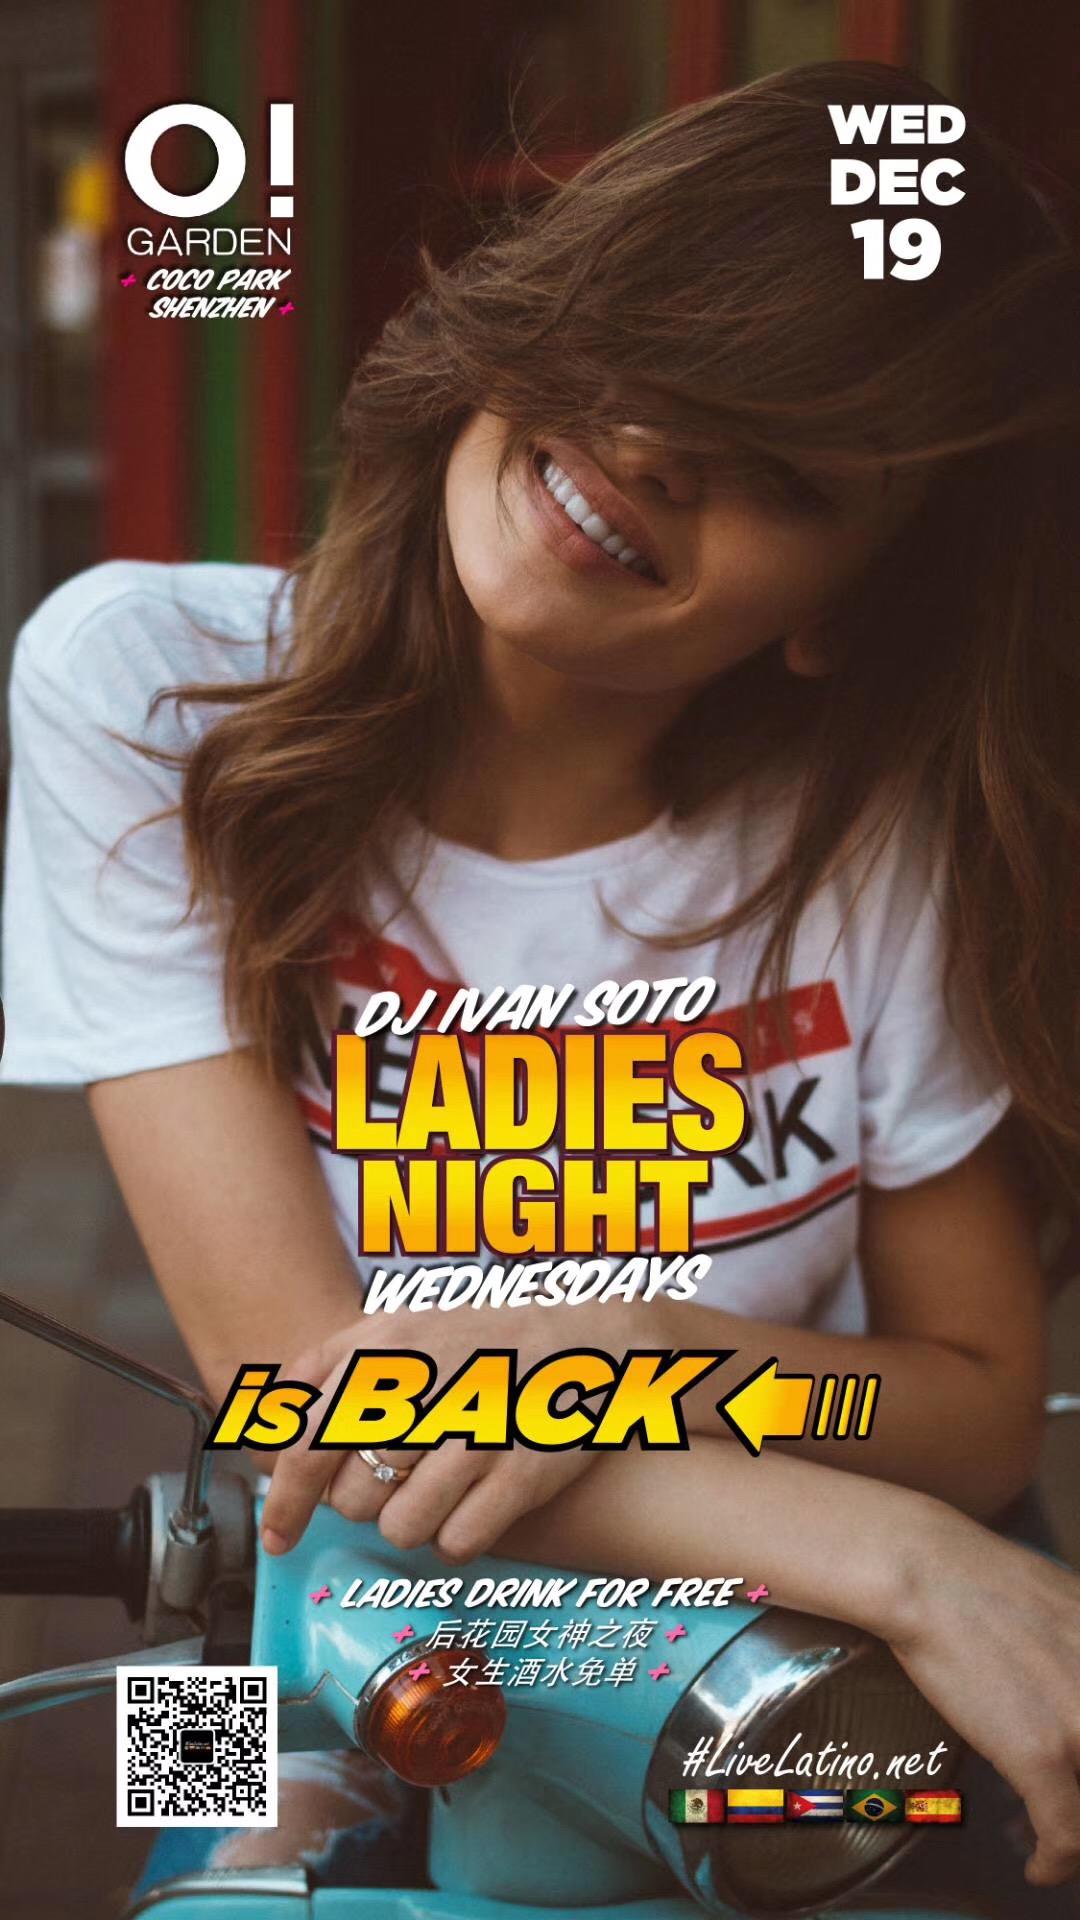 【O! GARDEN】LADIES NIGHT Wednesdays[#LiveLatino.net] (ドリンク無料)